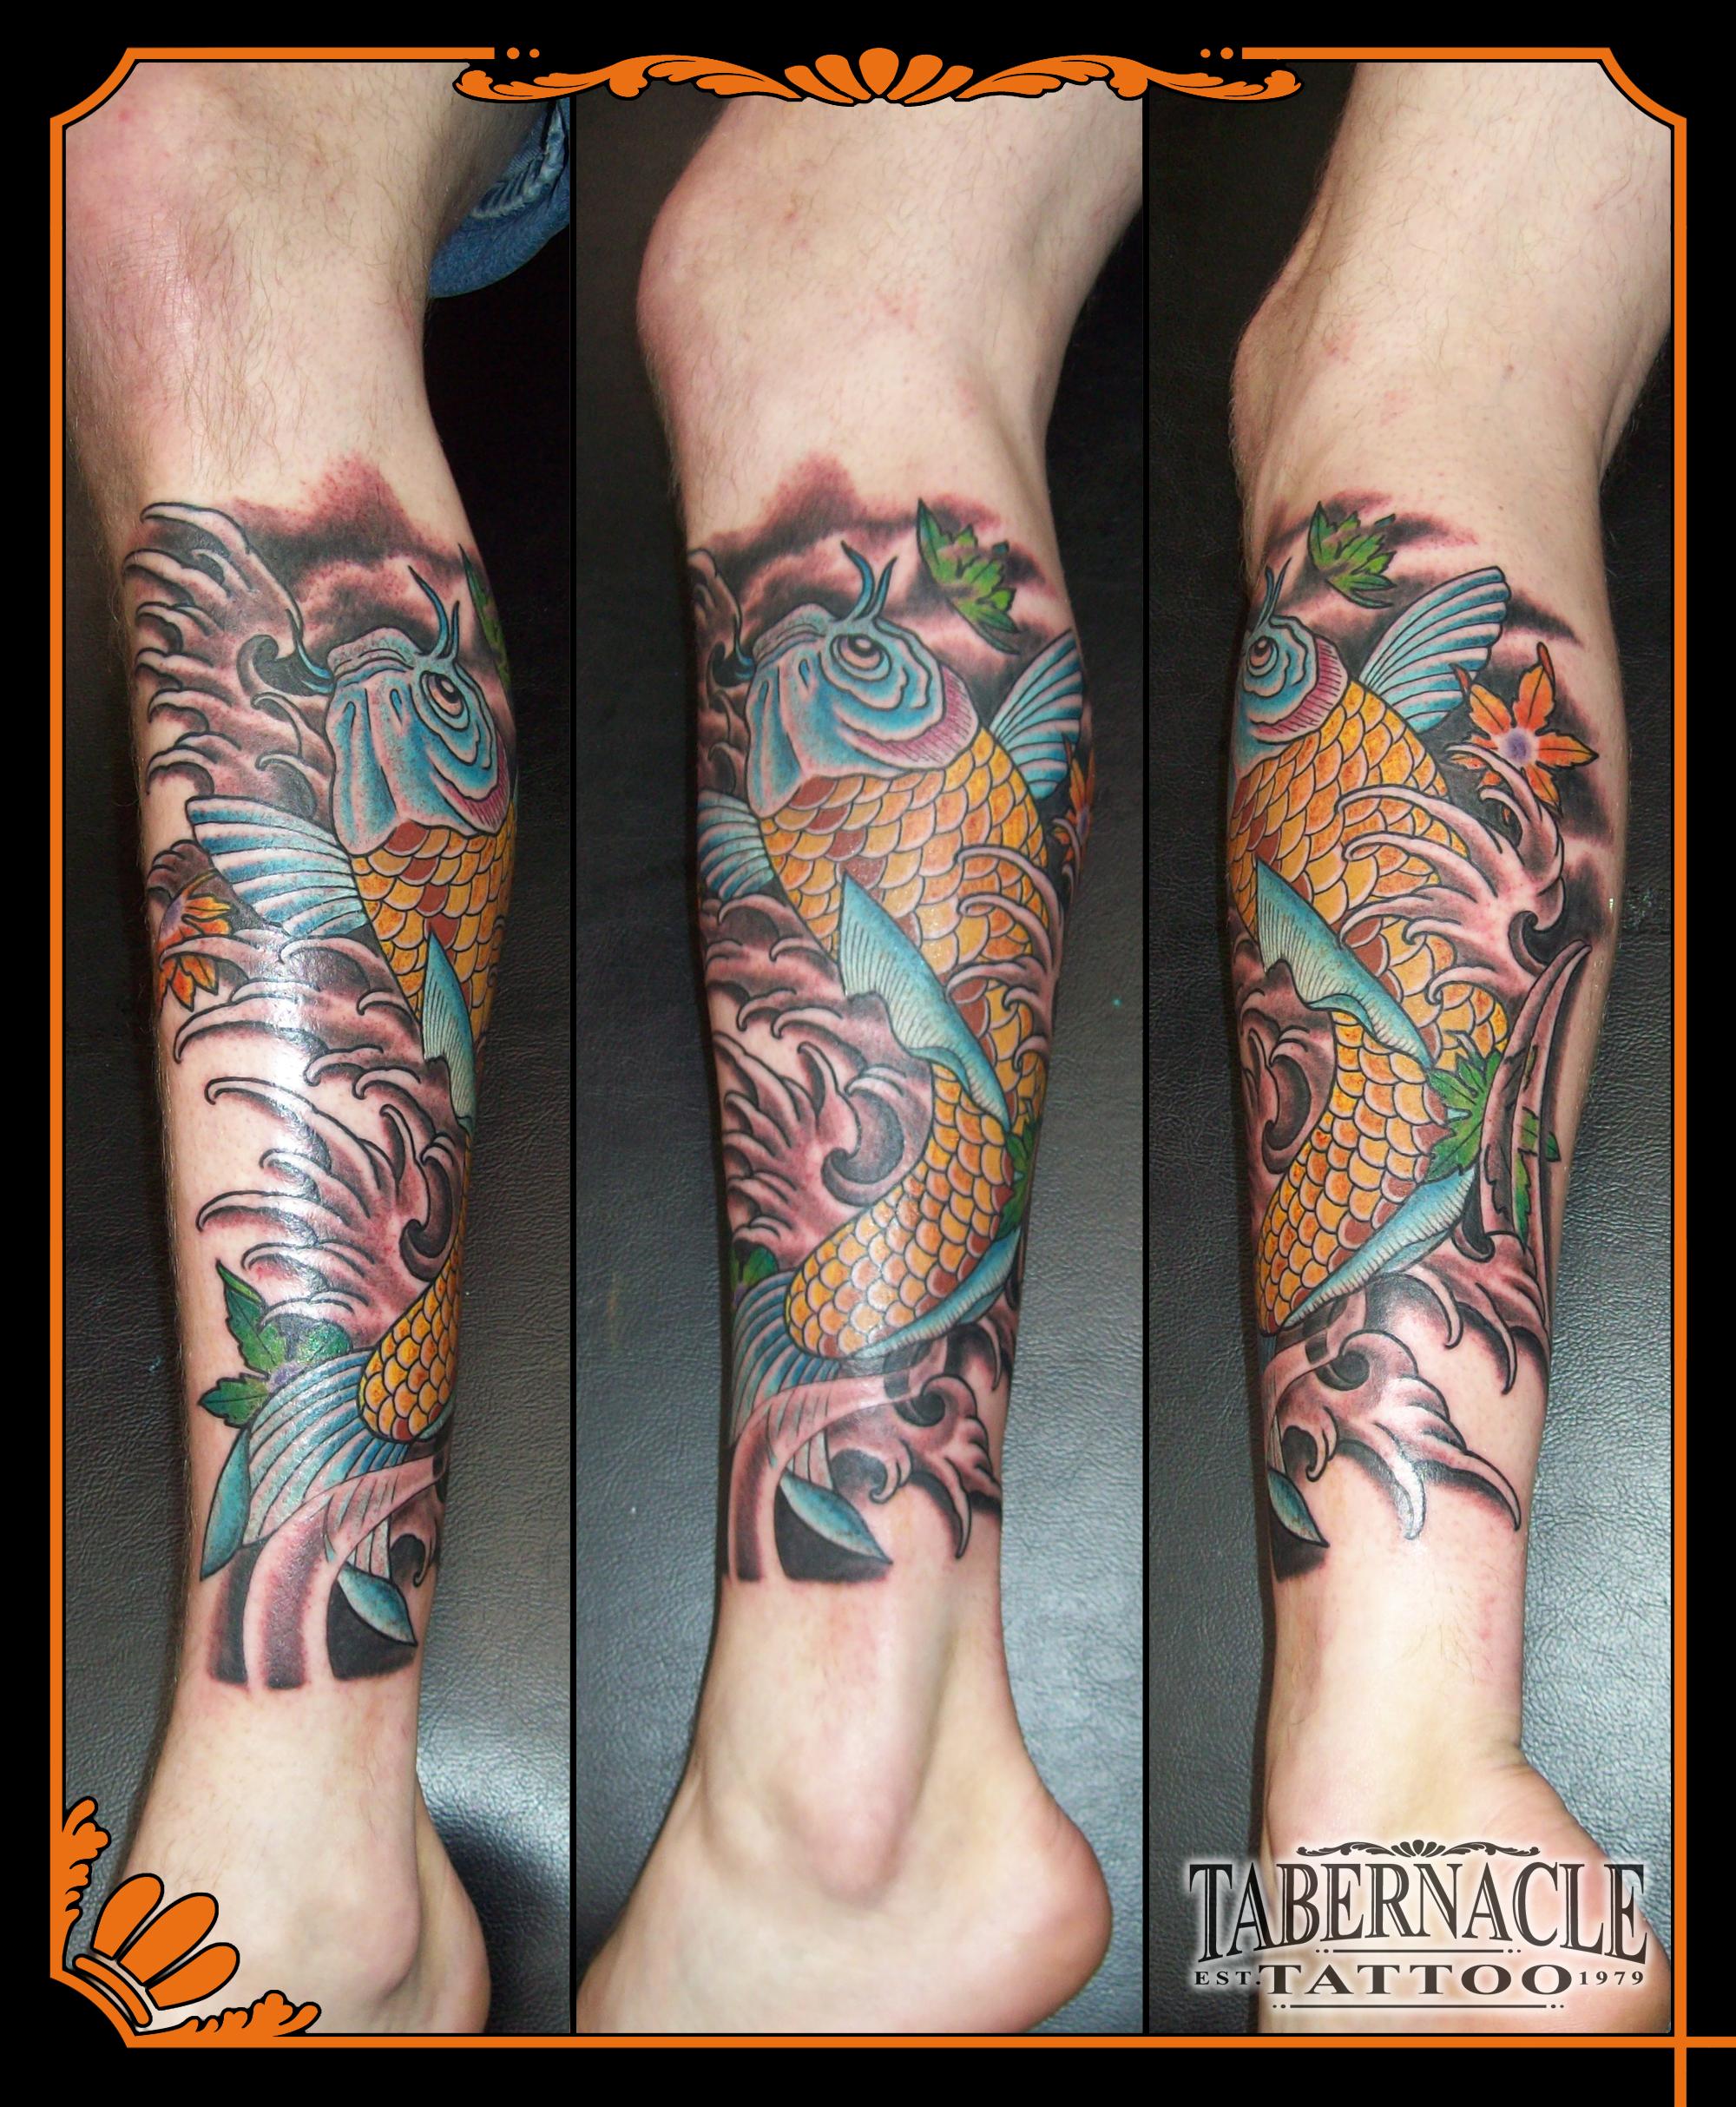 Tabernacle tattoo tampa koi fish tattoo for Best tattoo shops in tampa